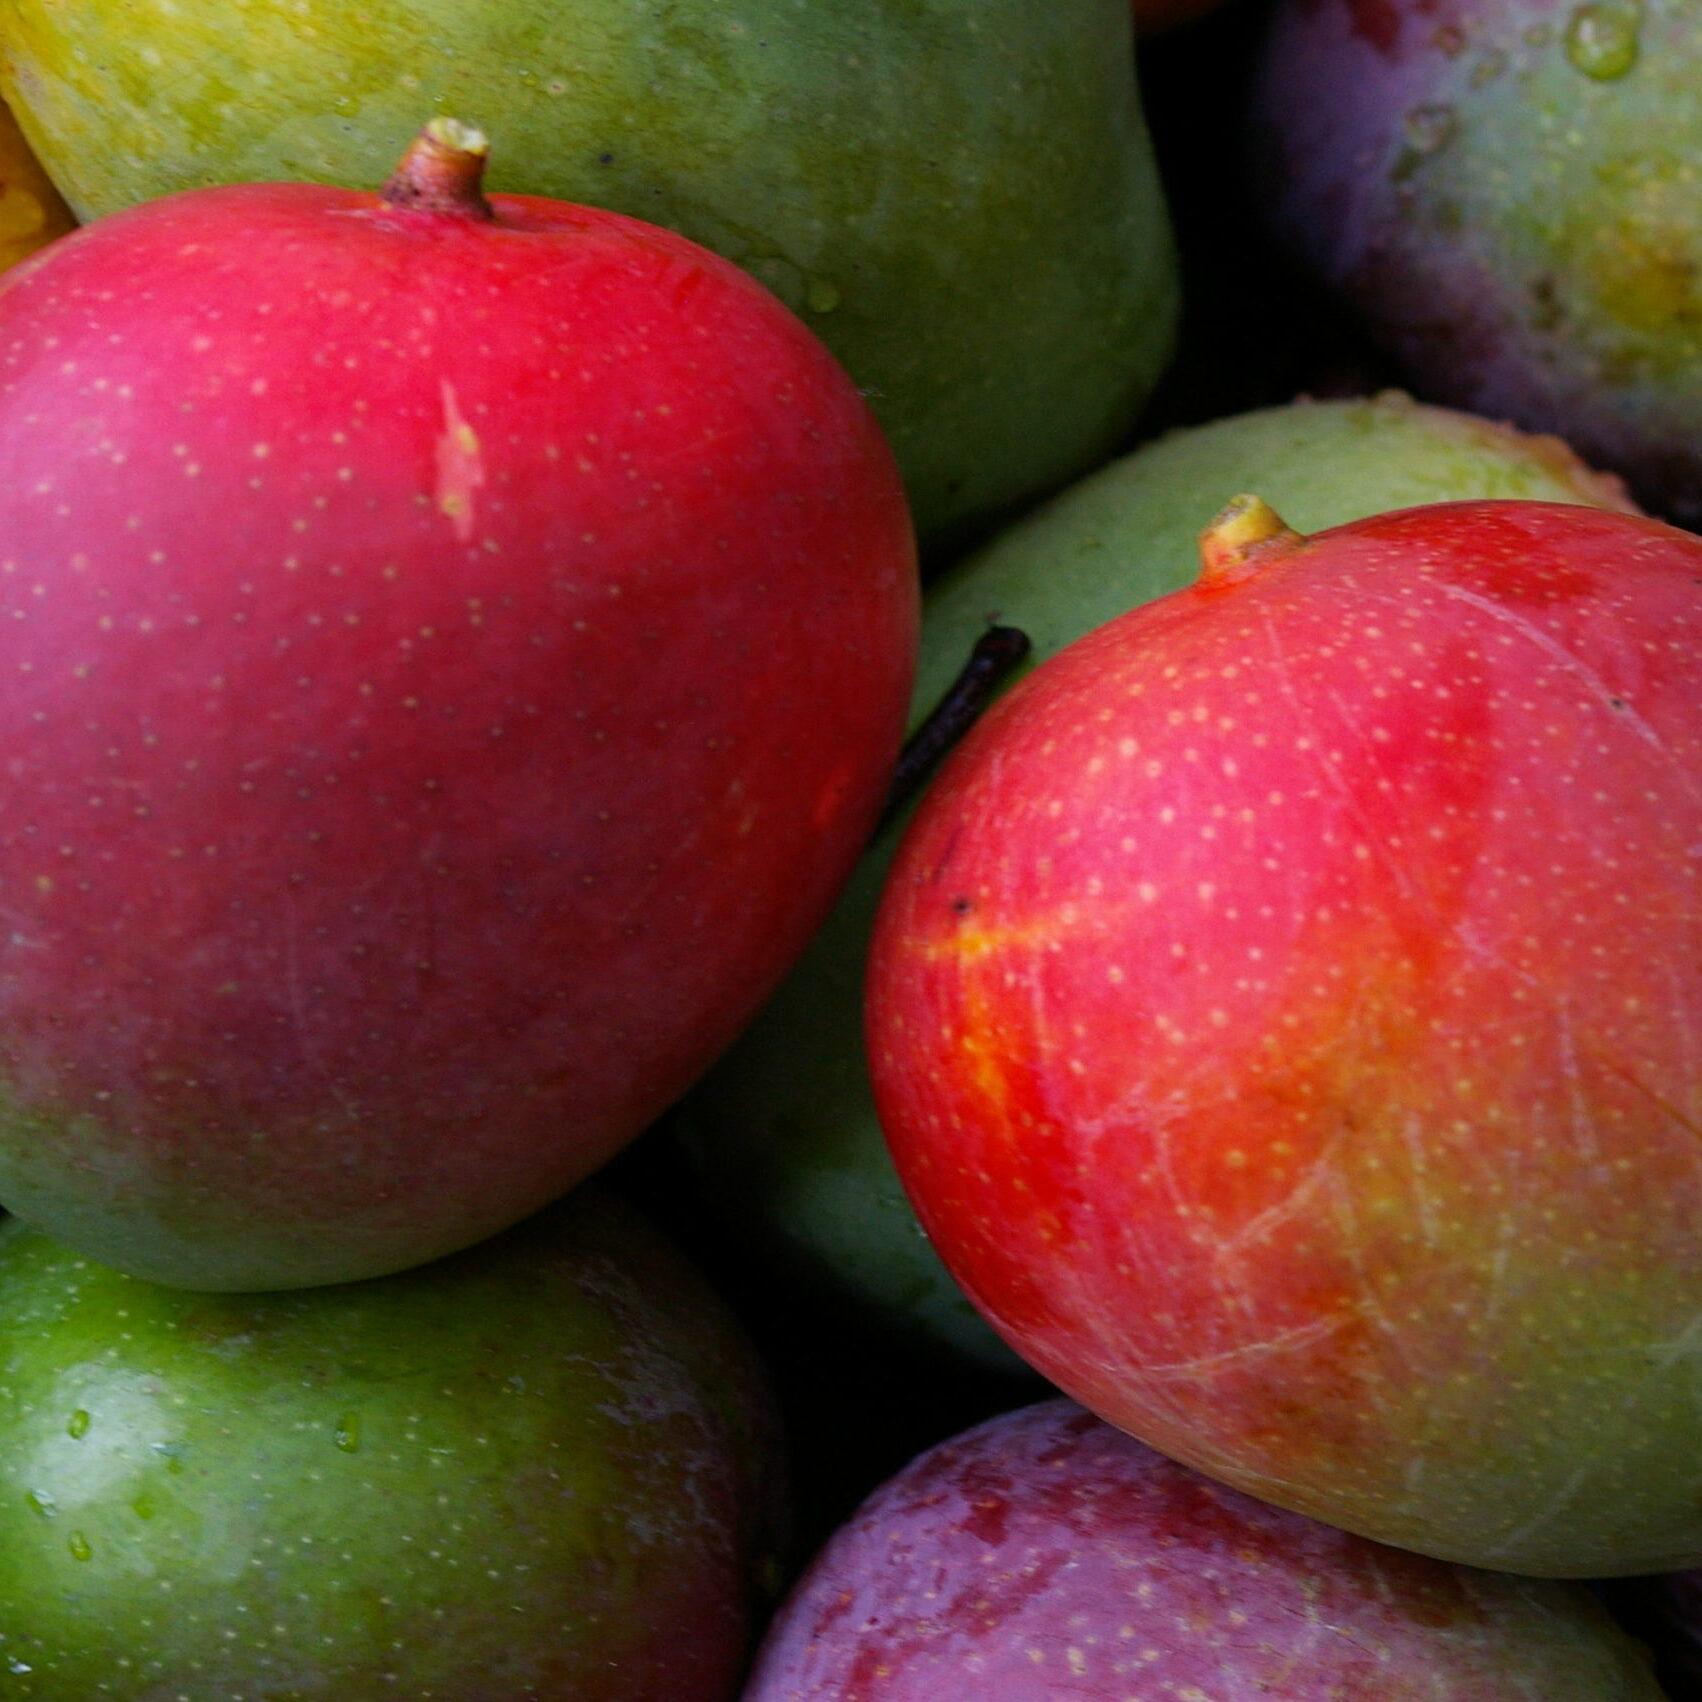 FruitPics 010